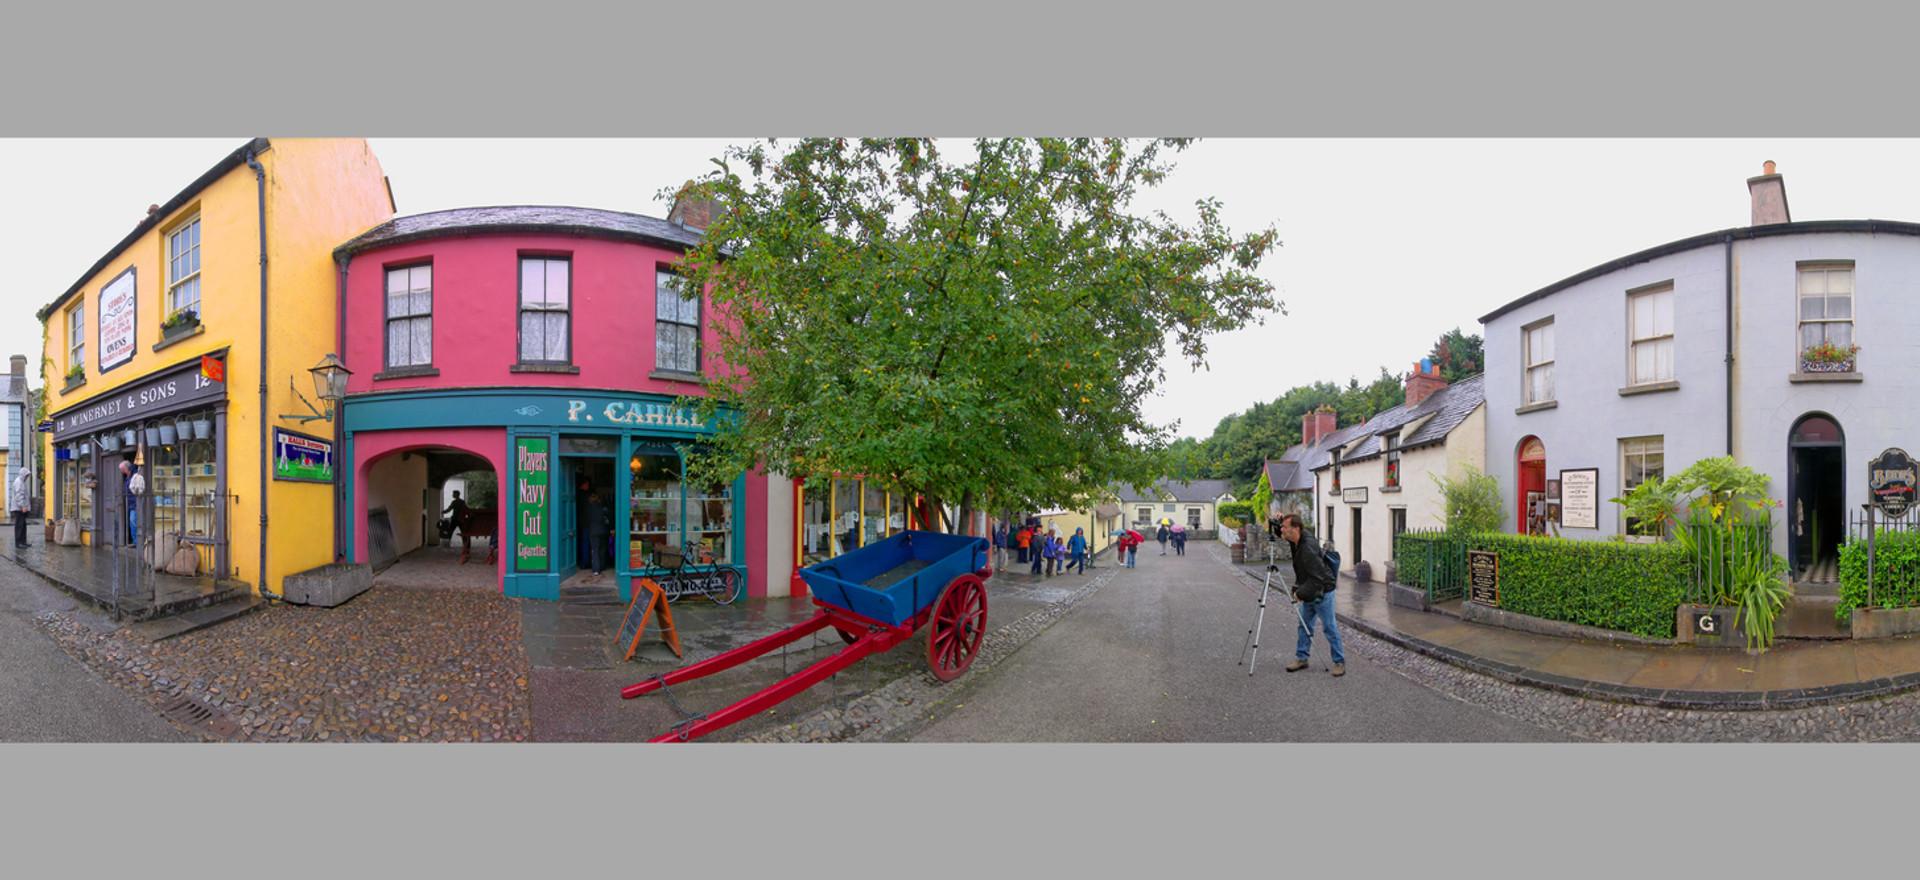 Bunratty Village, Ireland